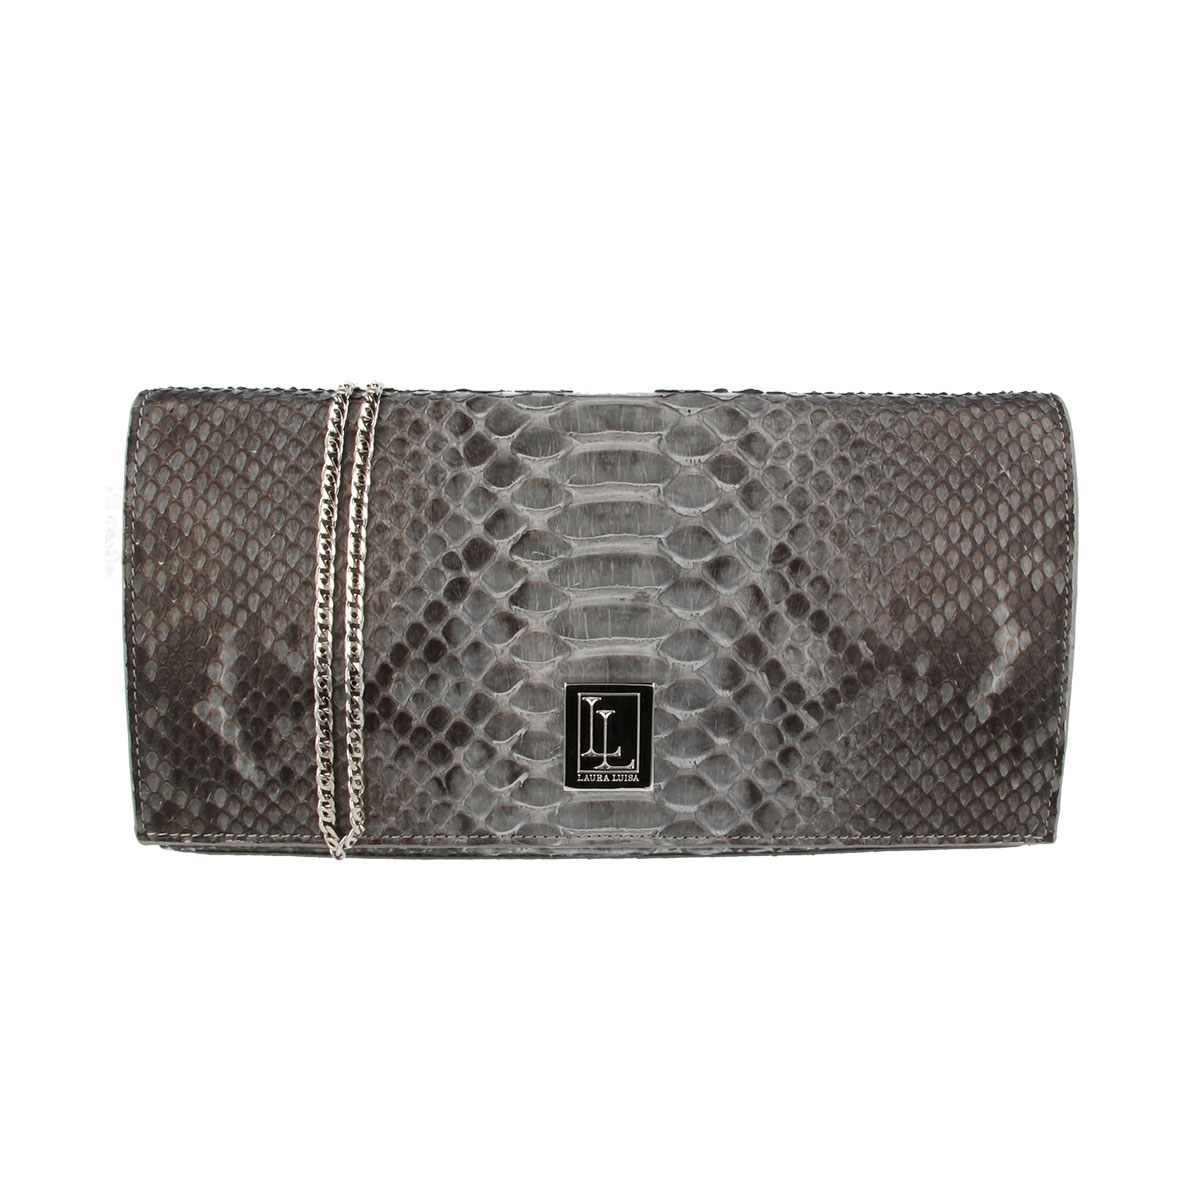 shop- 0022 Celia Bag 4 Handtaschen 2d 0003 0029 Handtaschen Tag2 2d 0044  Handtaschen 2d 0003 0028 Handtaschen Tag2 2d 0045 ... 7ae2e67760c09